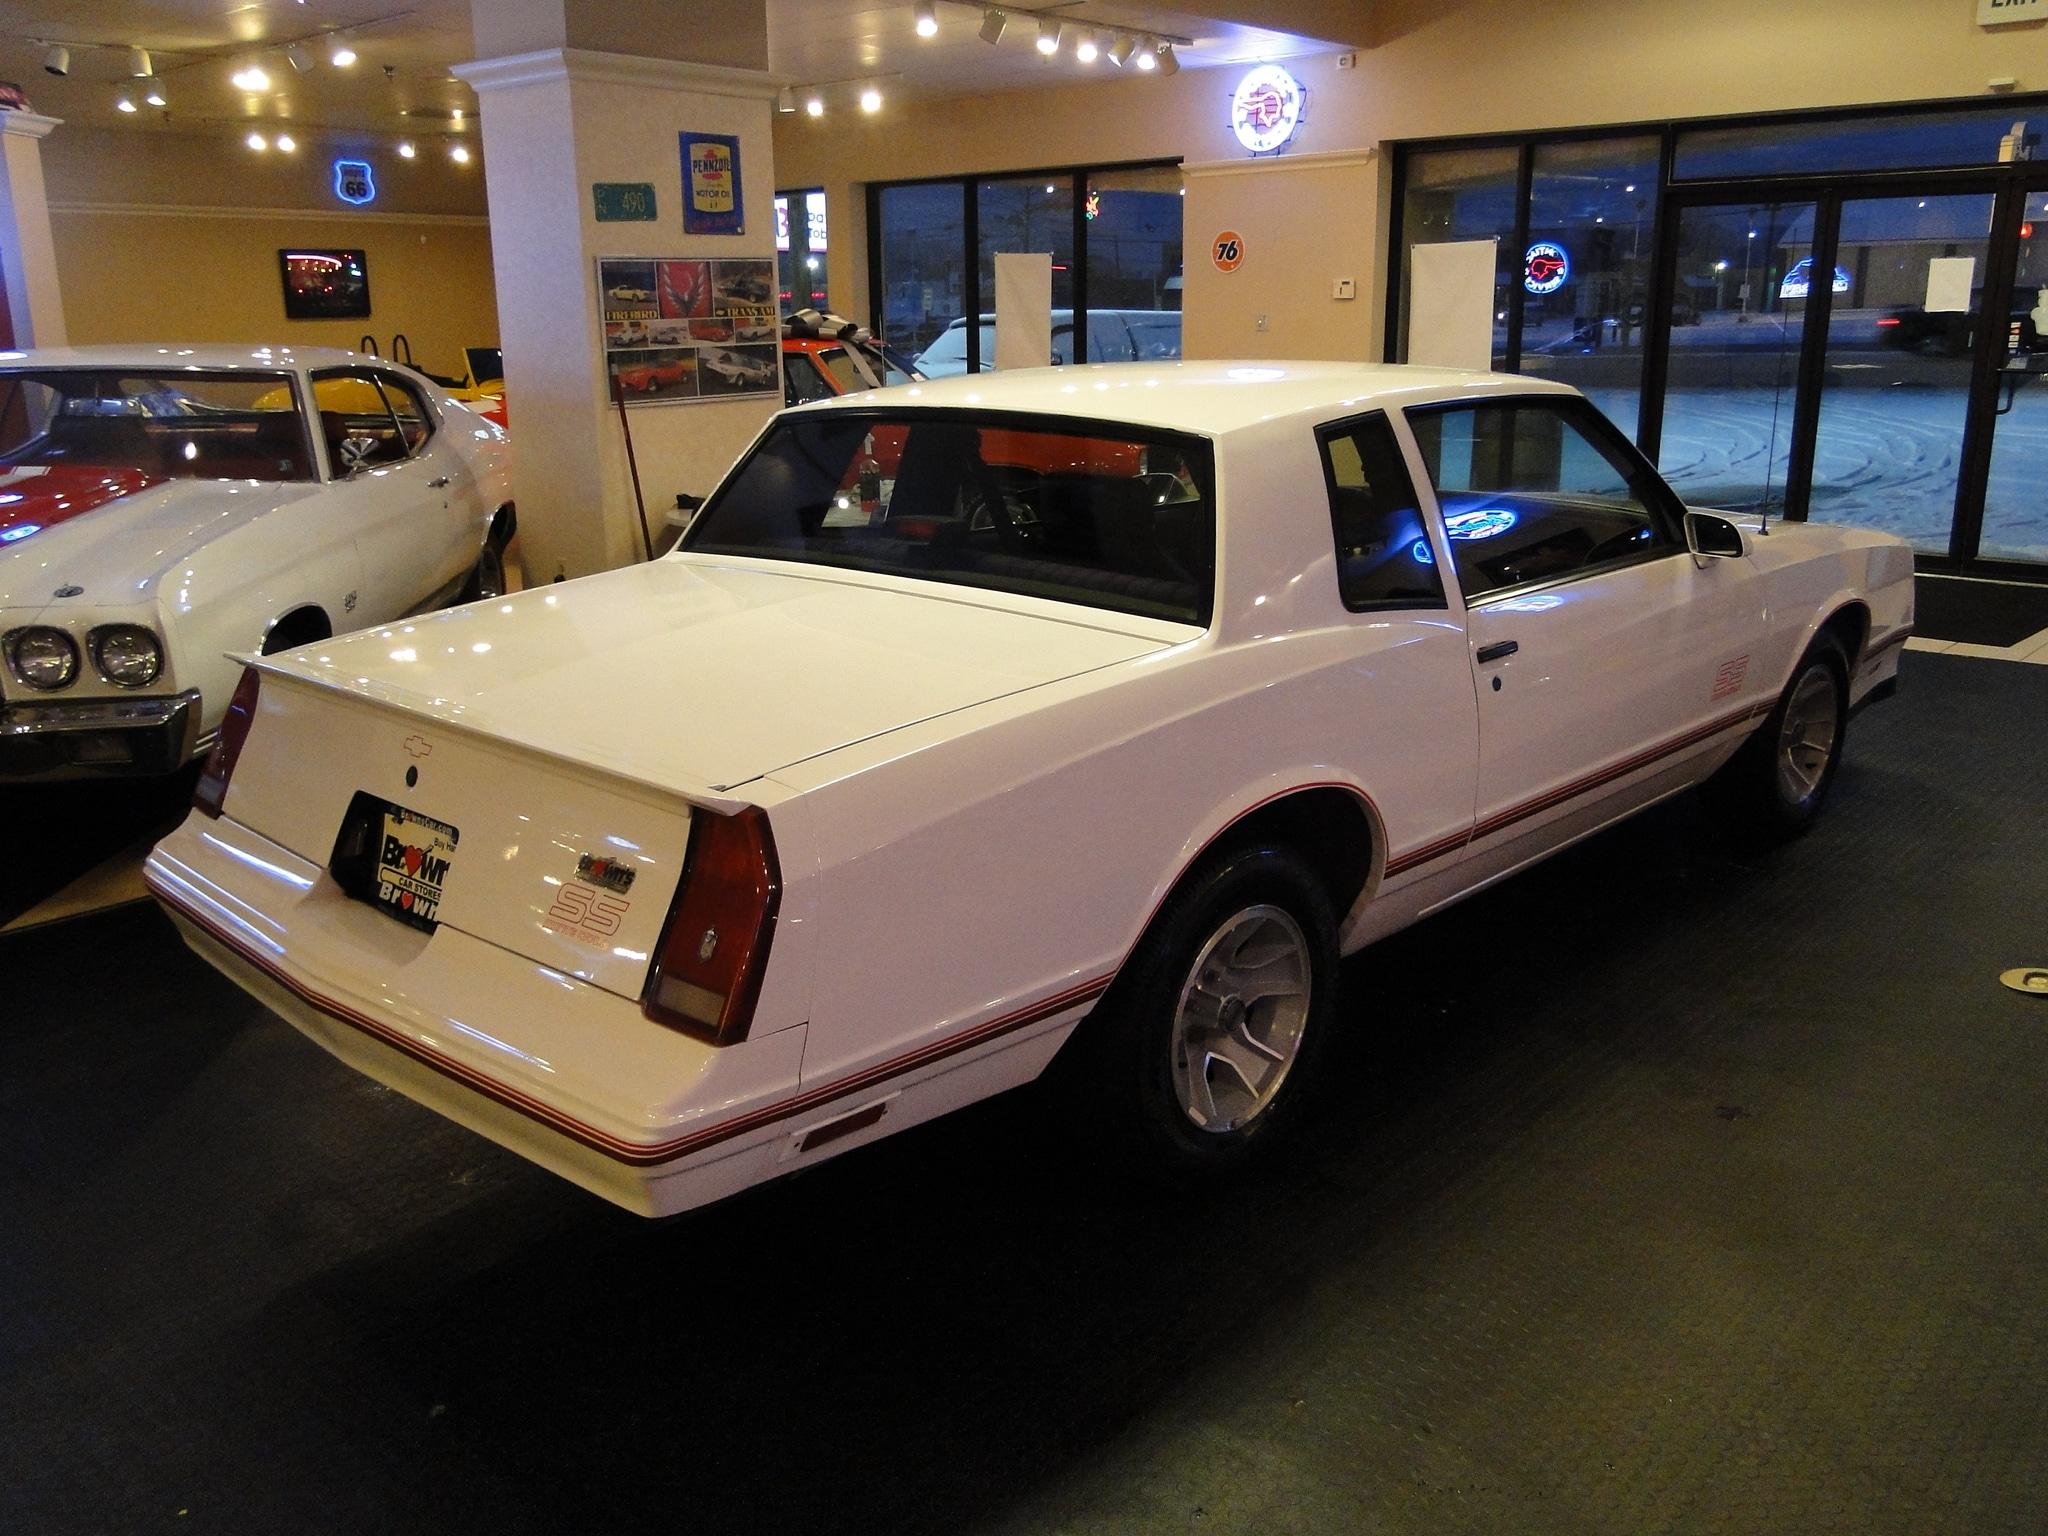 Used 1987 Chevrolet Monte Carlo SS in Alexandria, VA - R0252